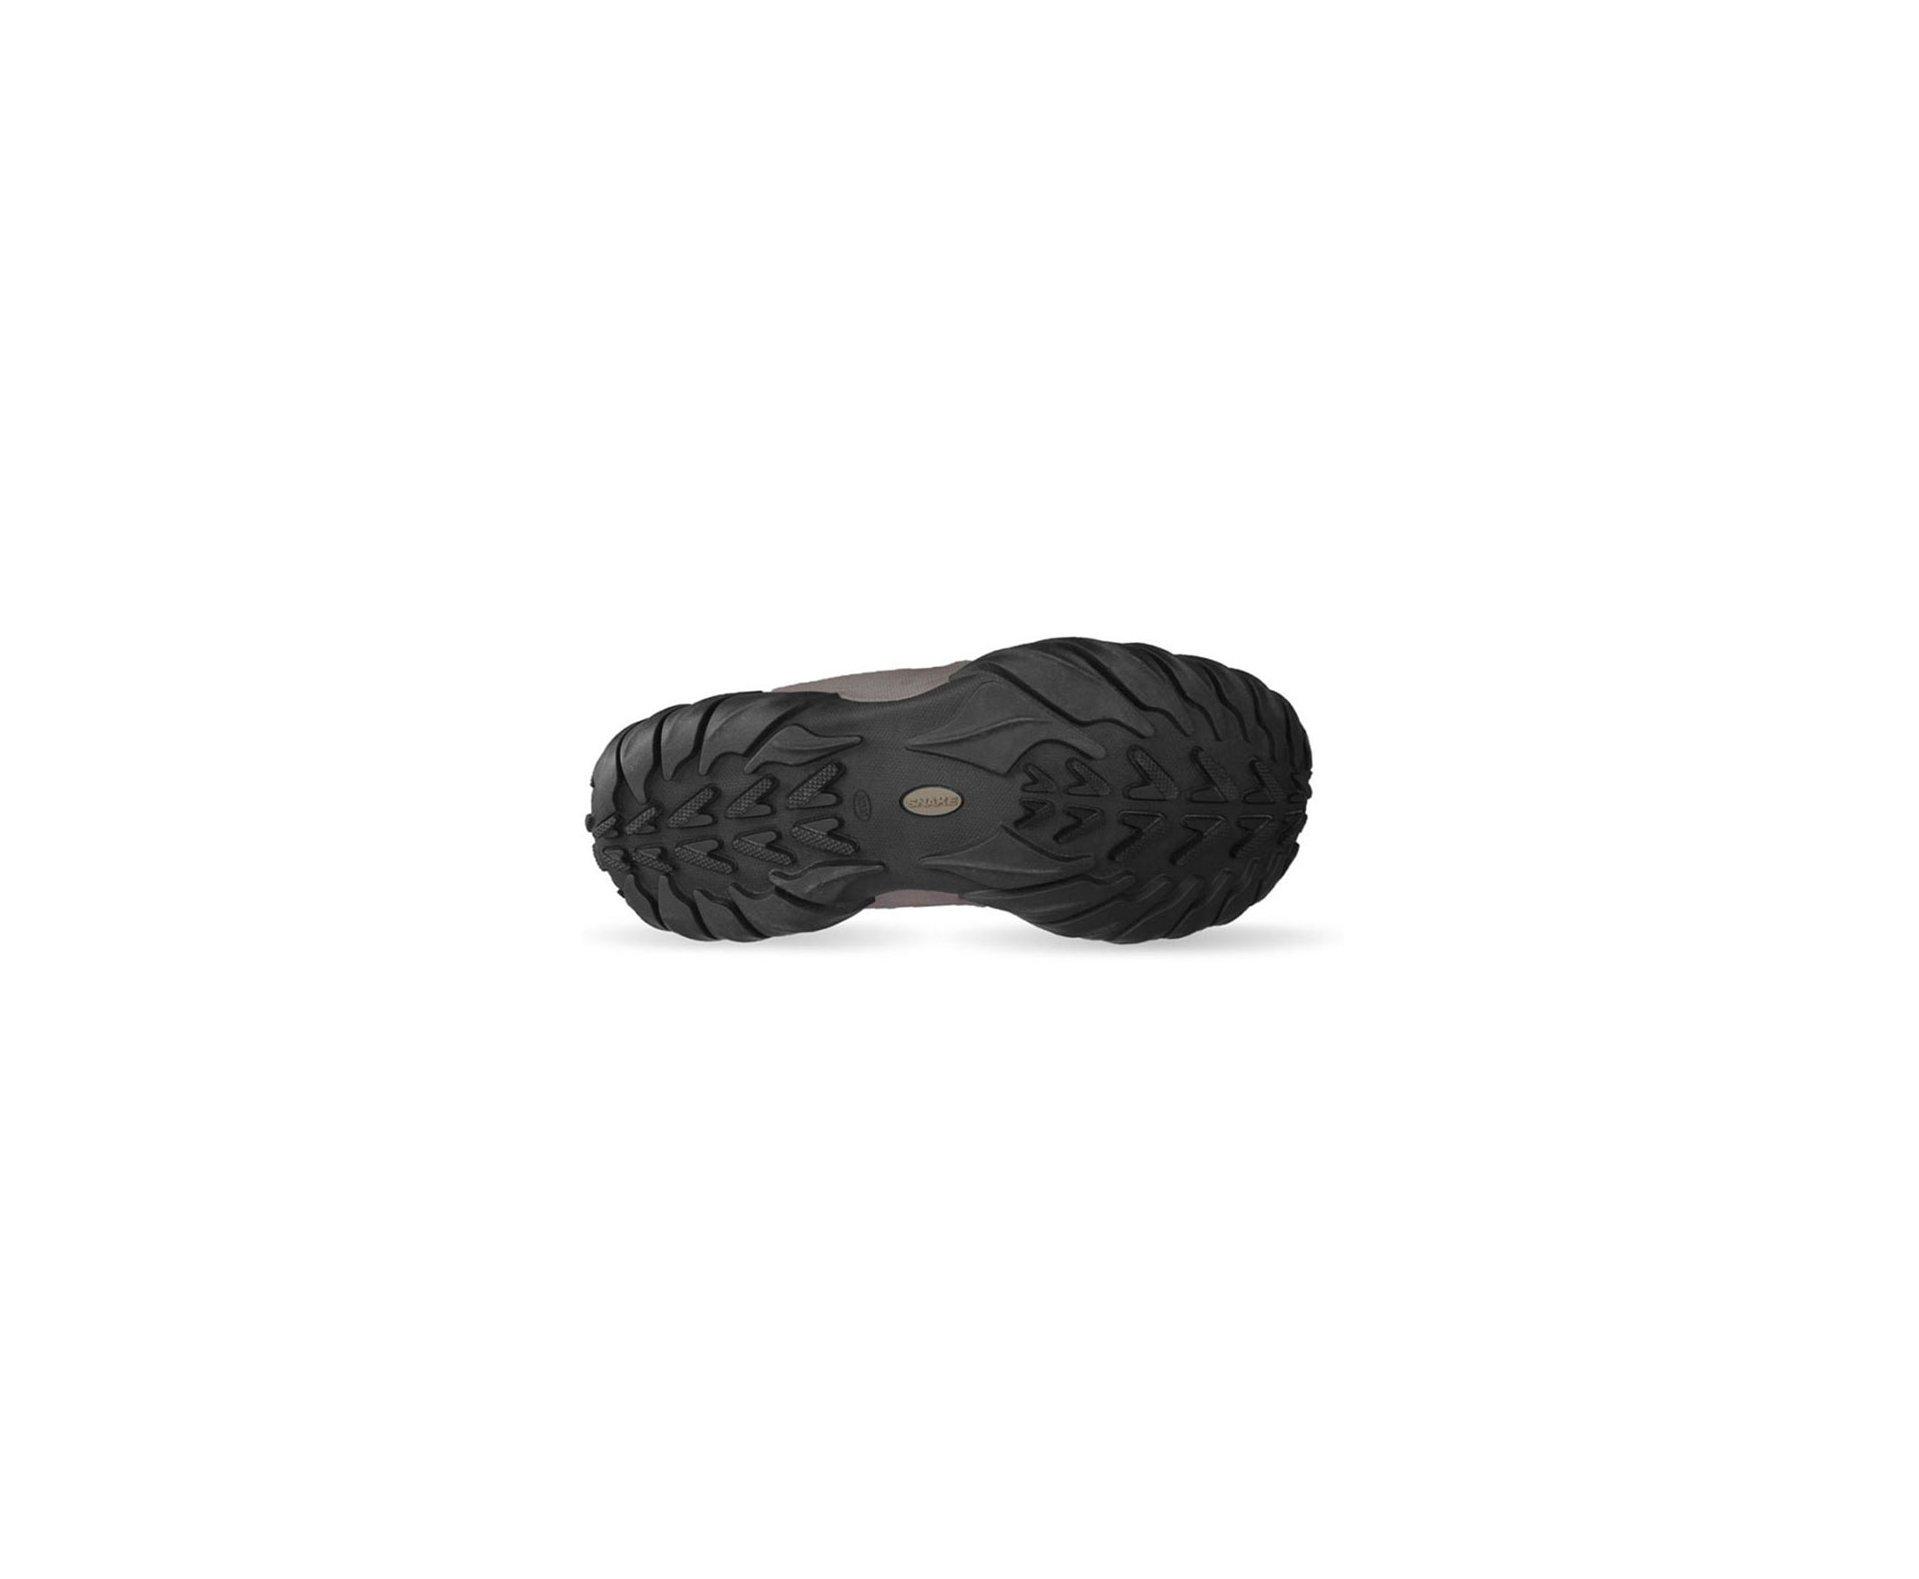 Bota Snake Andina X-treme Marrom/vermelho Ca 40.382 - 38